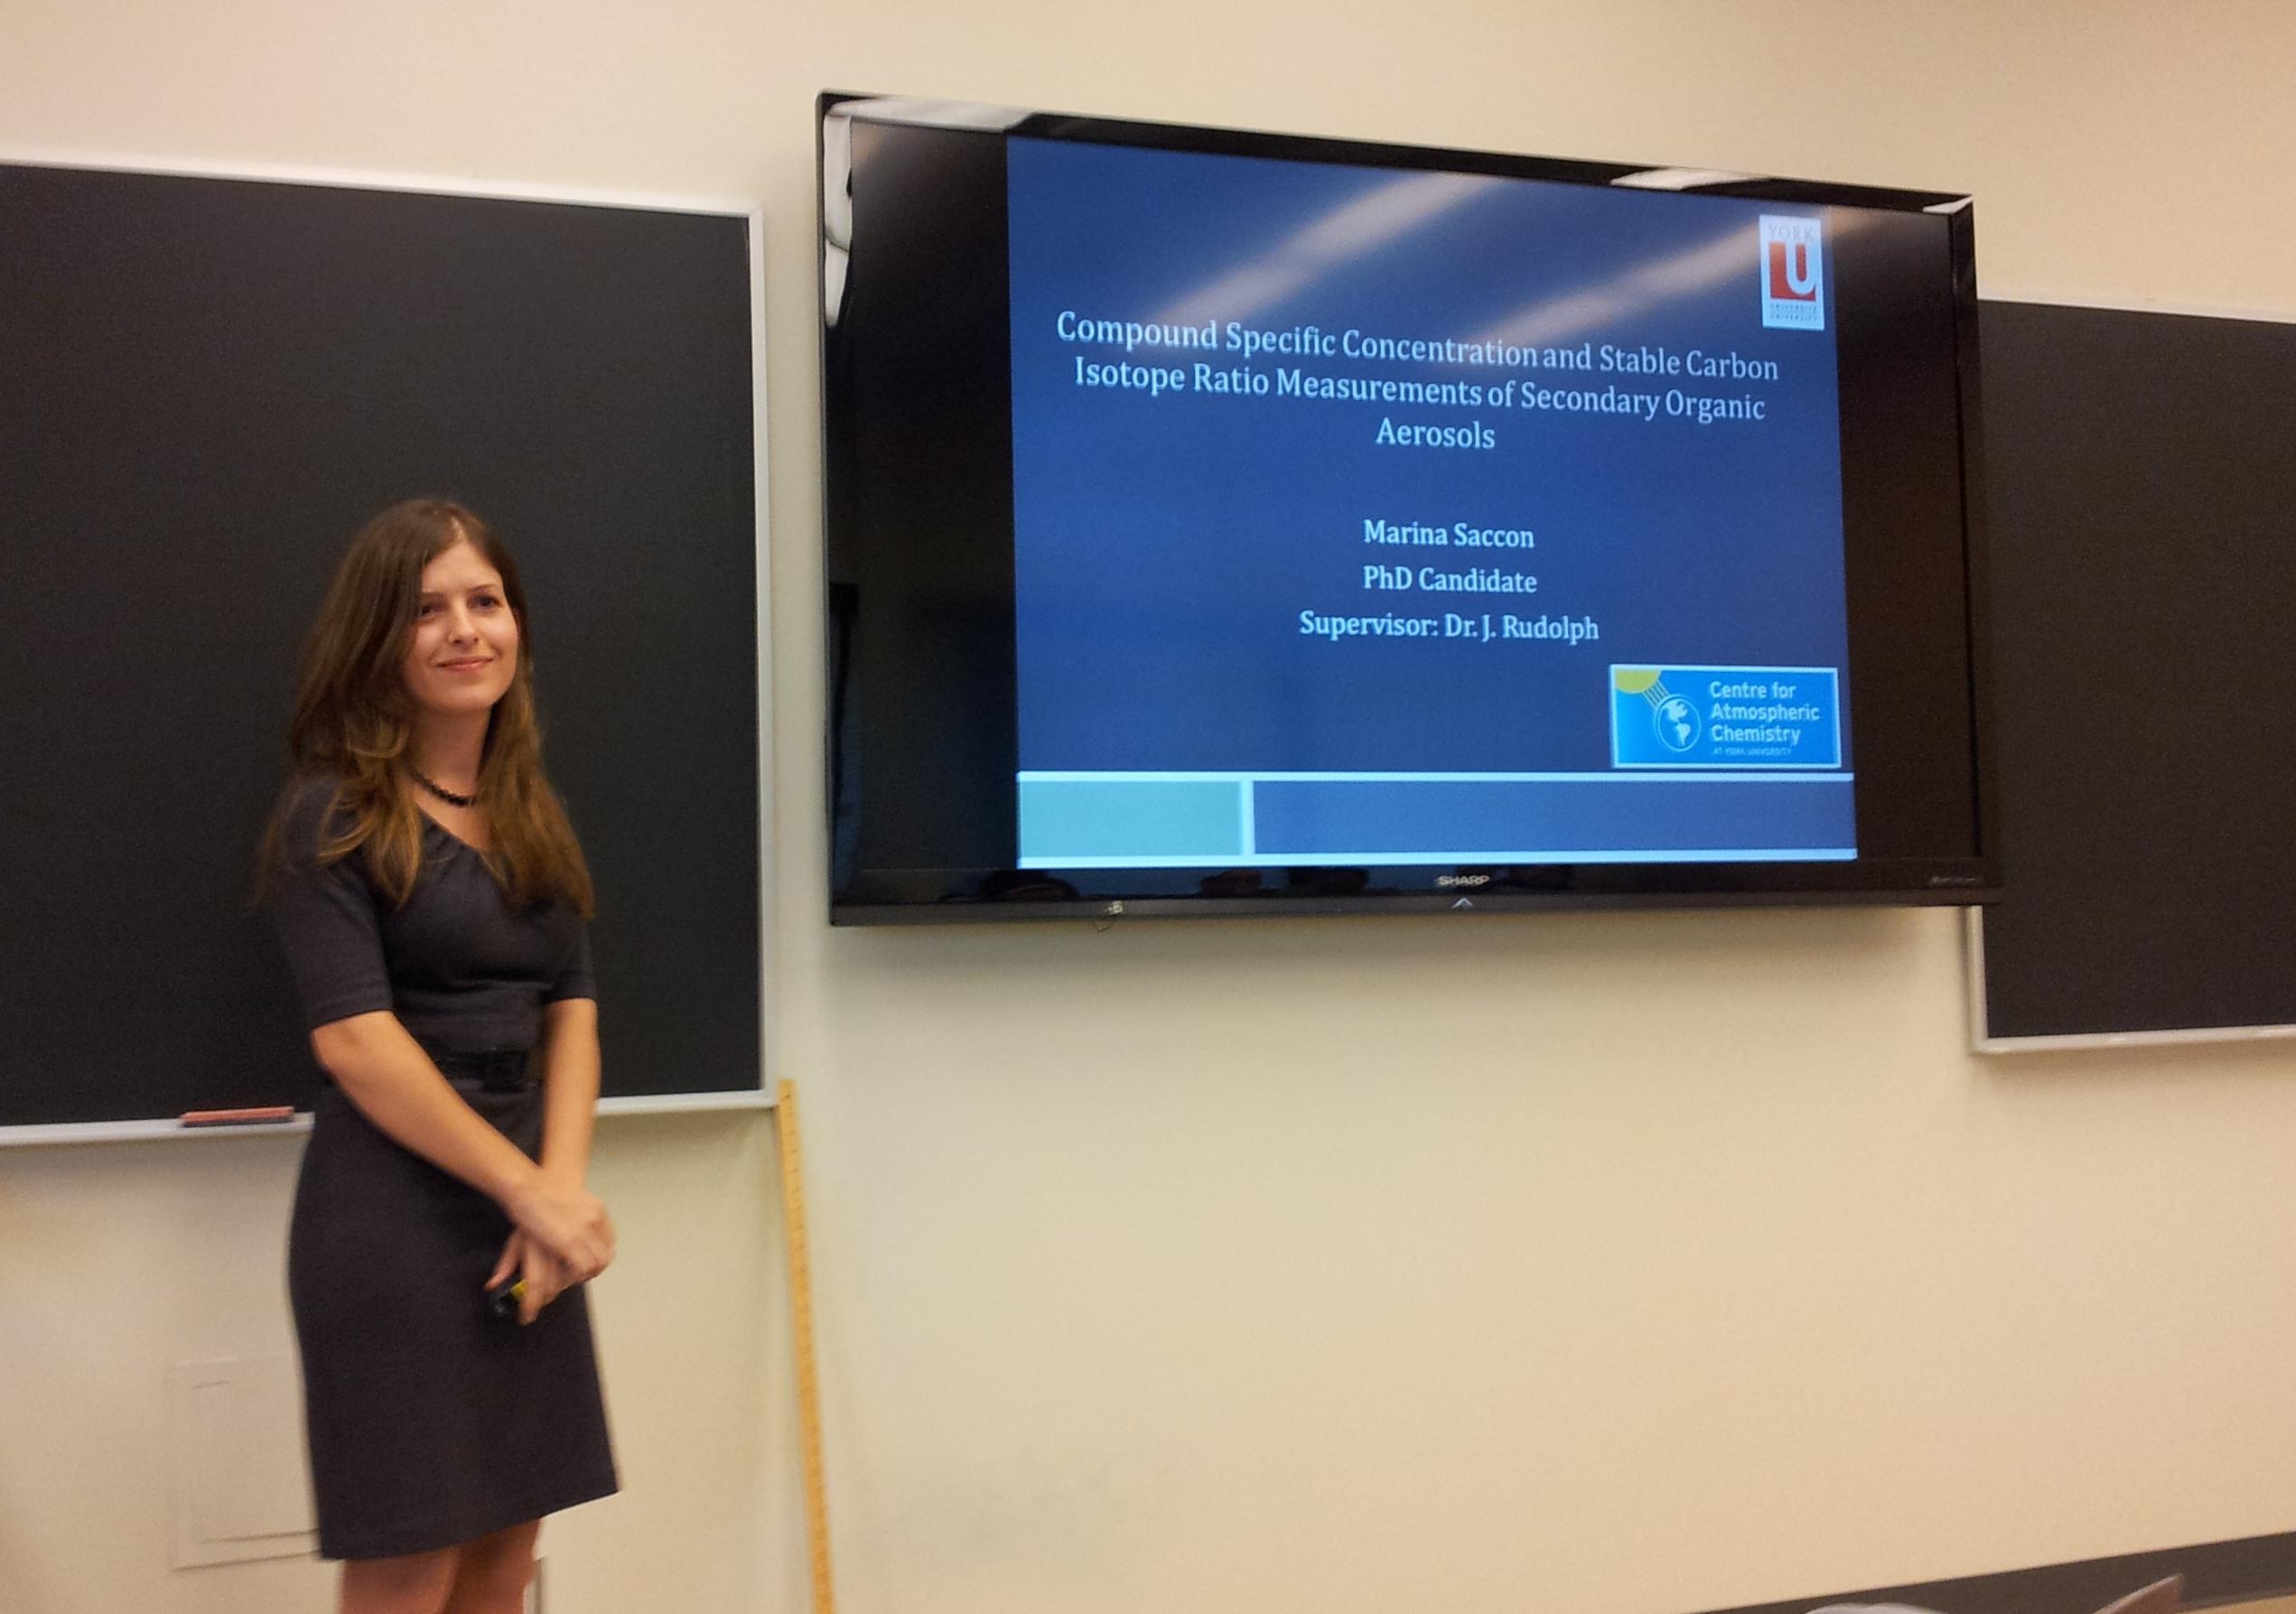 Marina Saccon presenting thesis